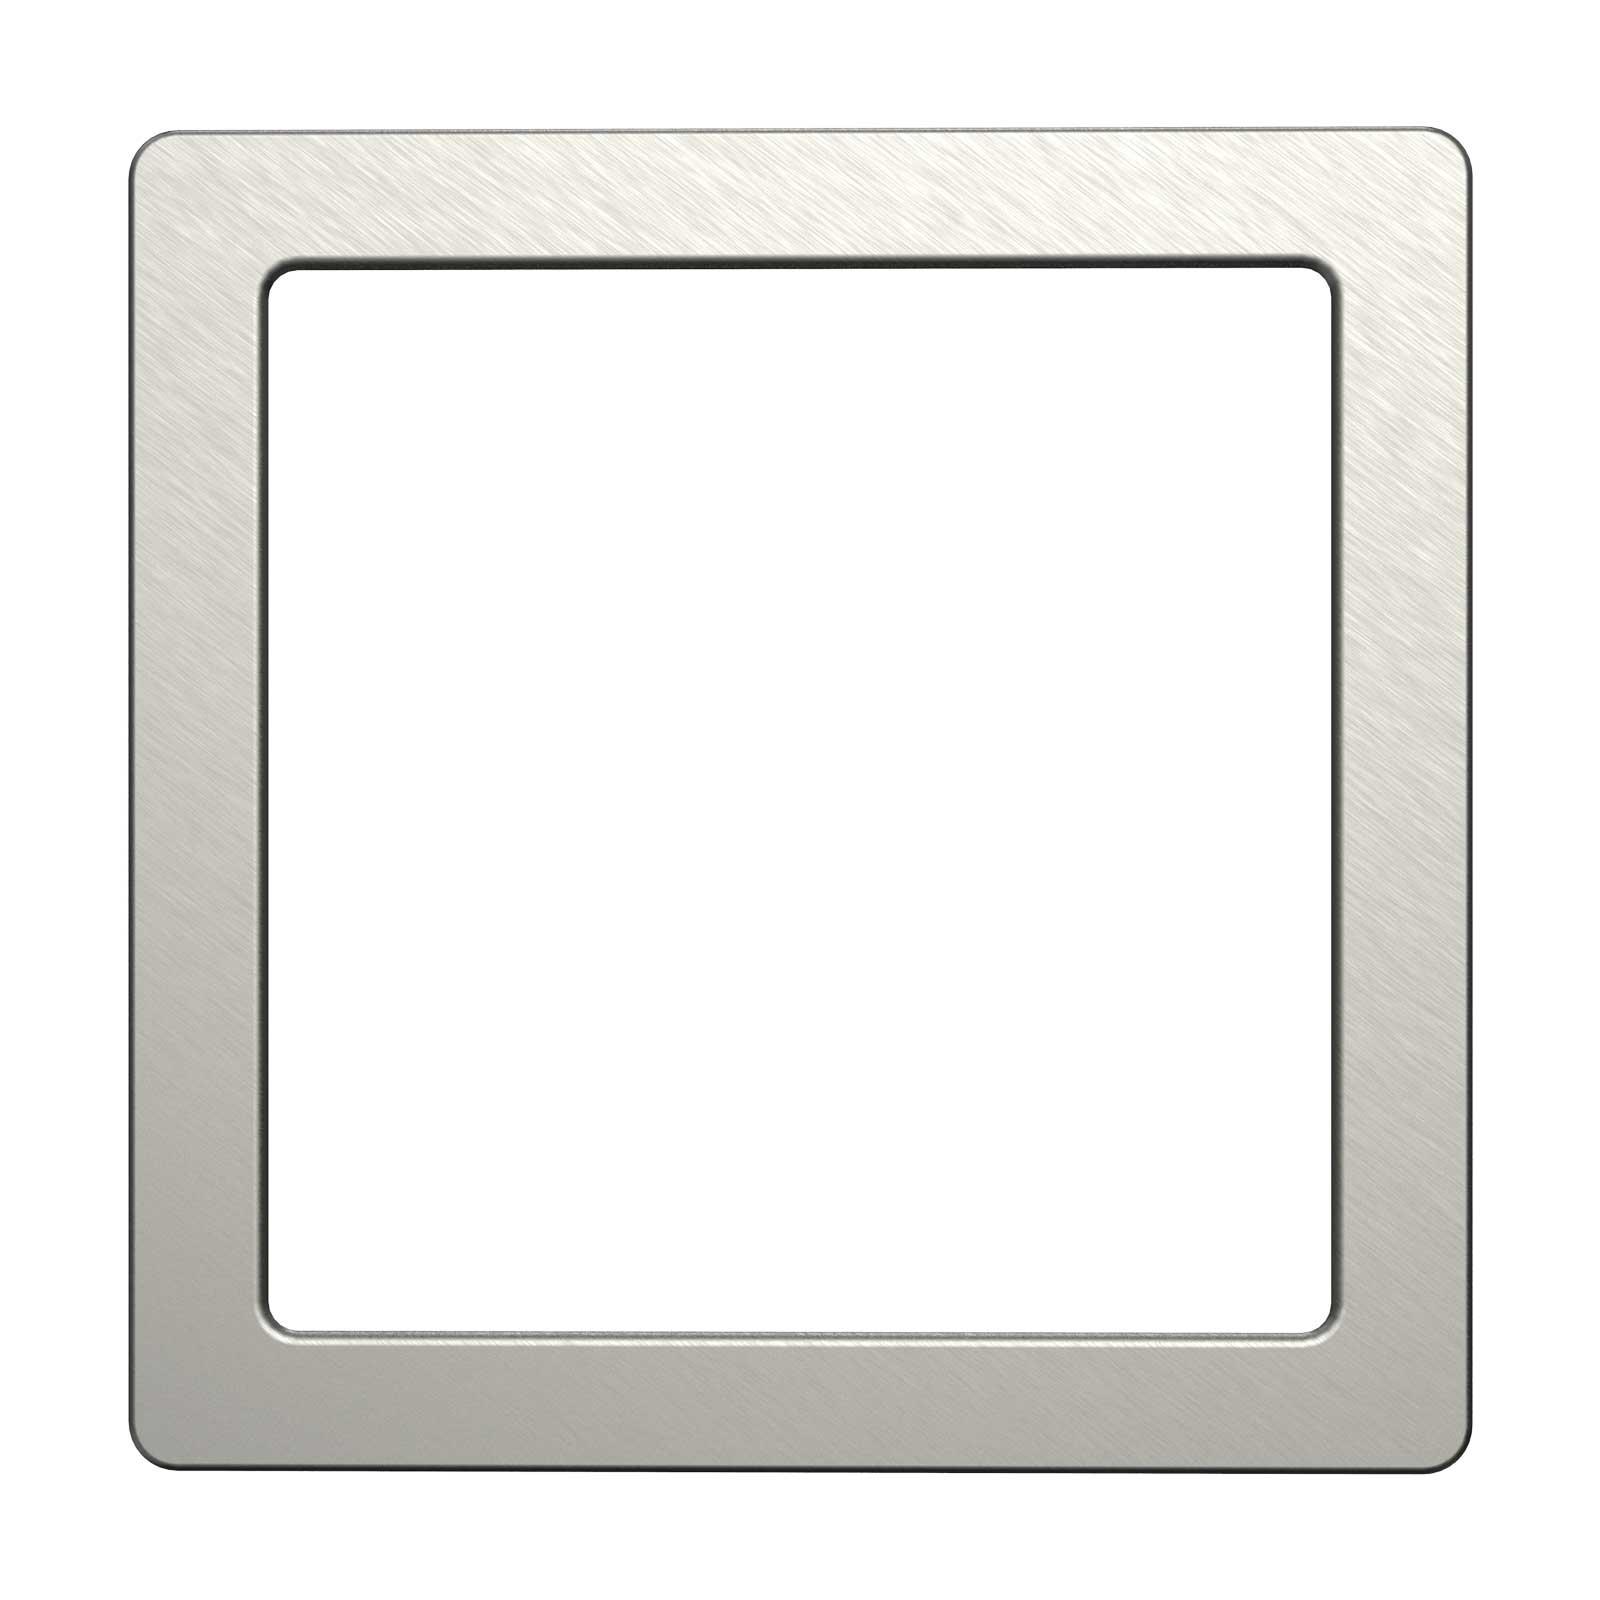 Megatron Pano magnetic cover angular Ø 16.5cm